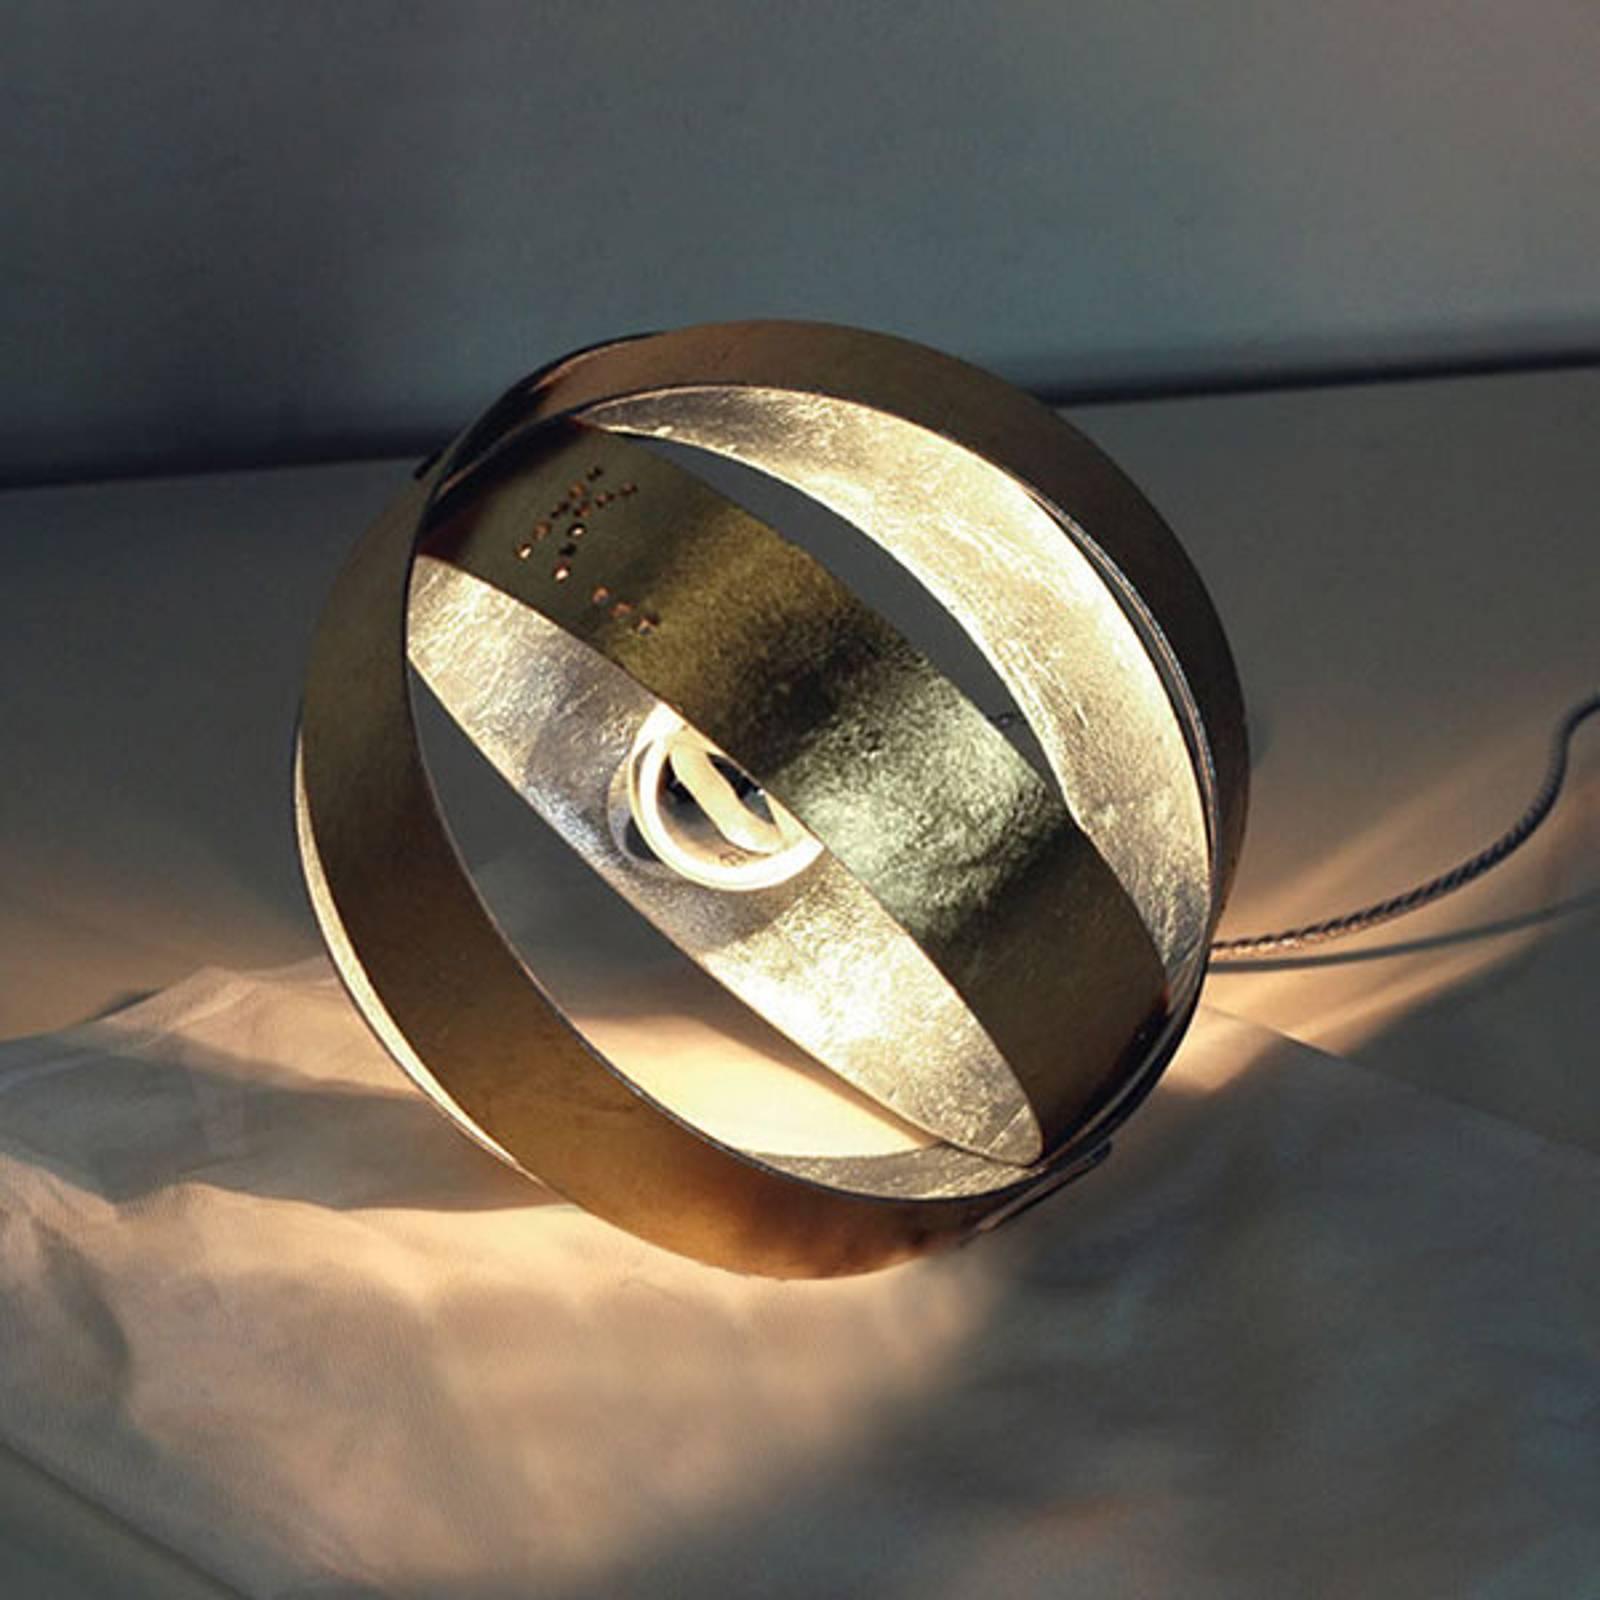 Knikerboker Ecliptika - moderni LED-pöytävalaisin